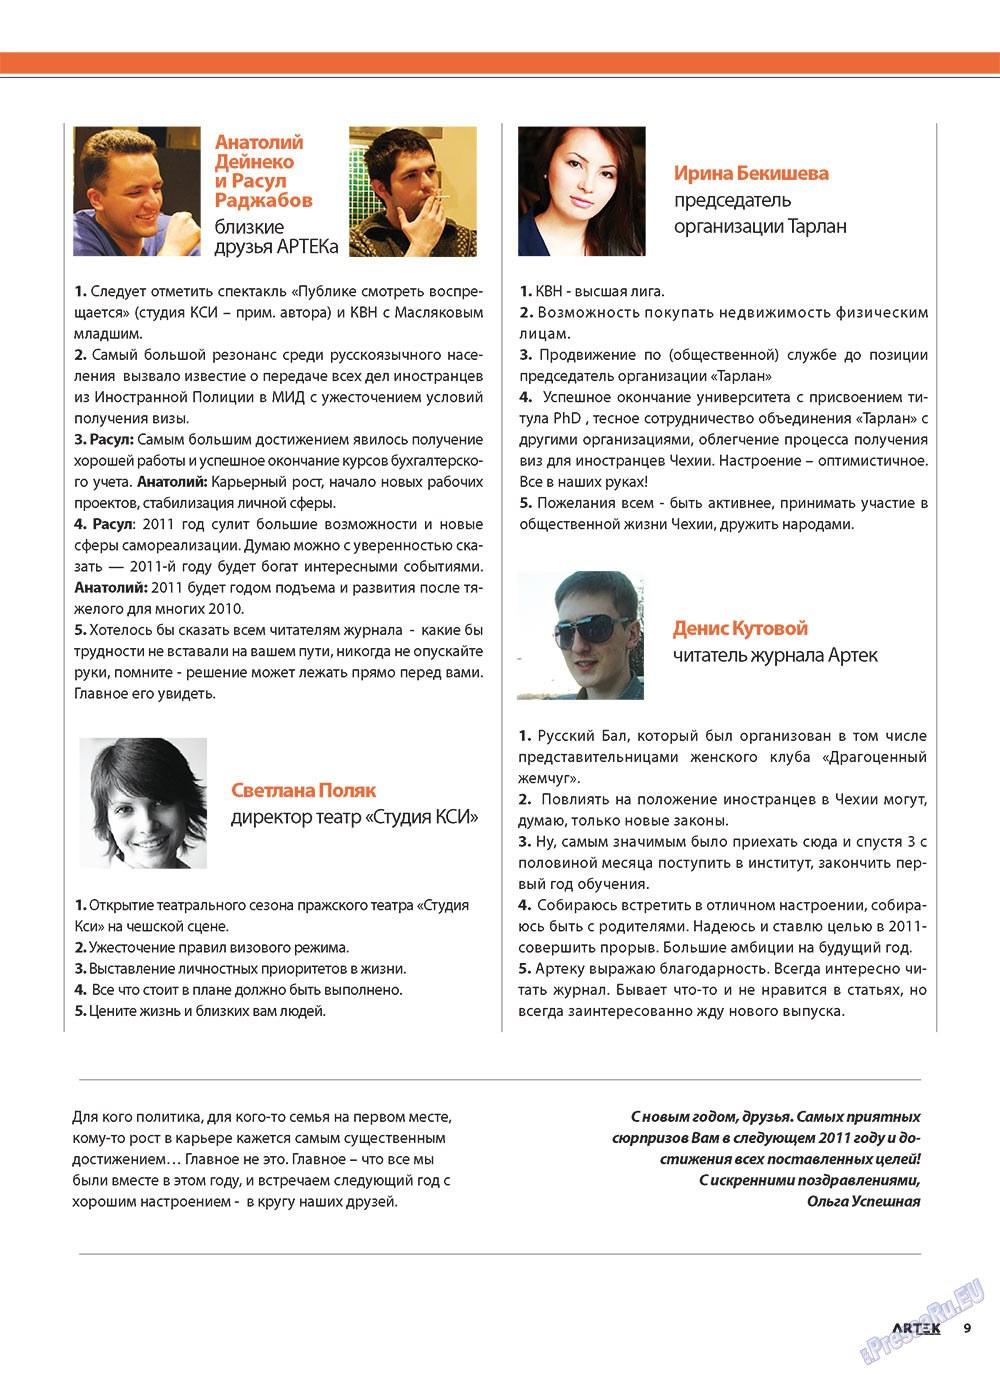 Артек (журнал). 2010 год, номер 6, стр. 11